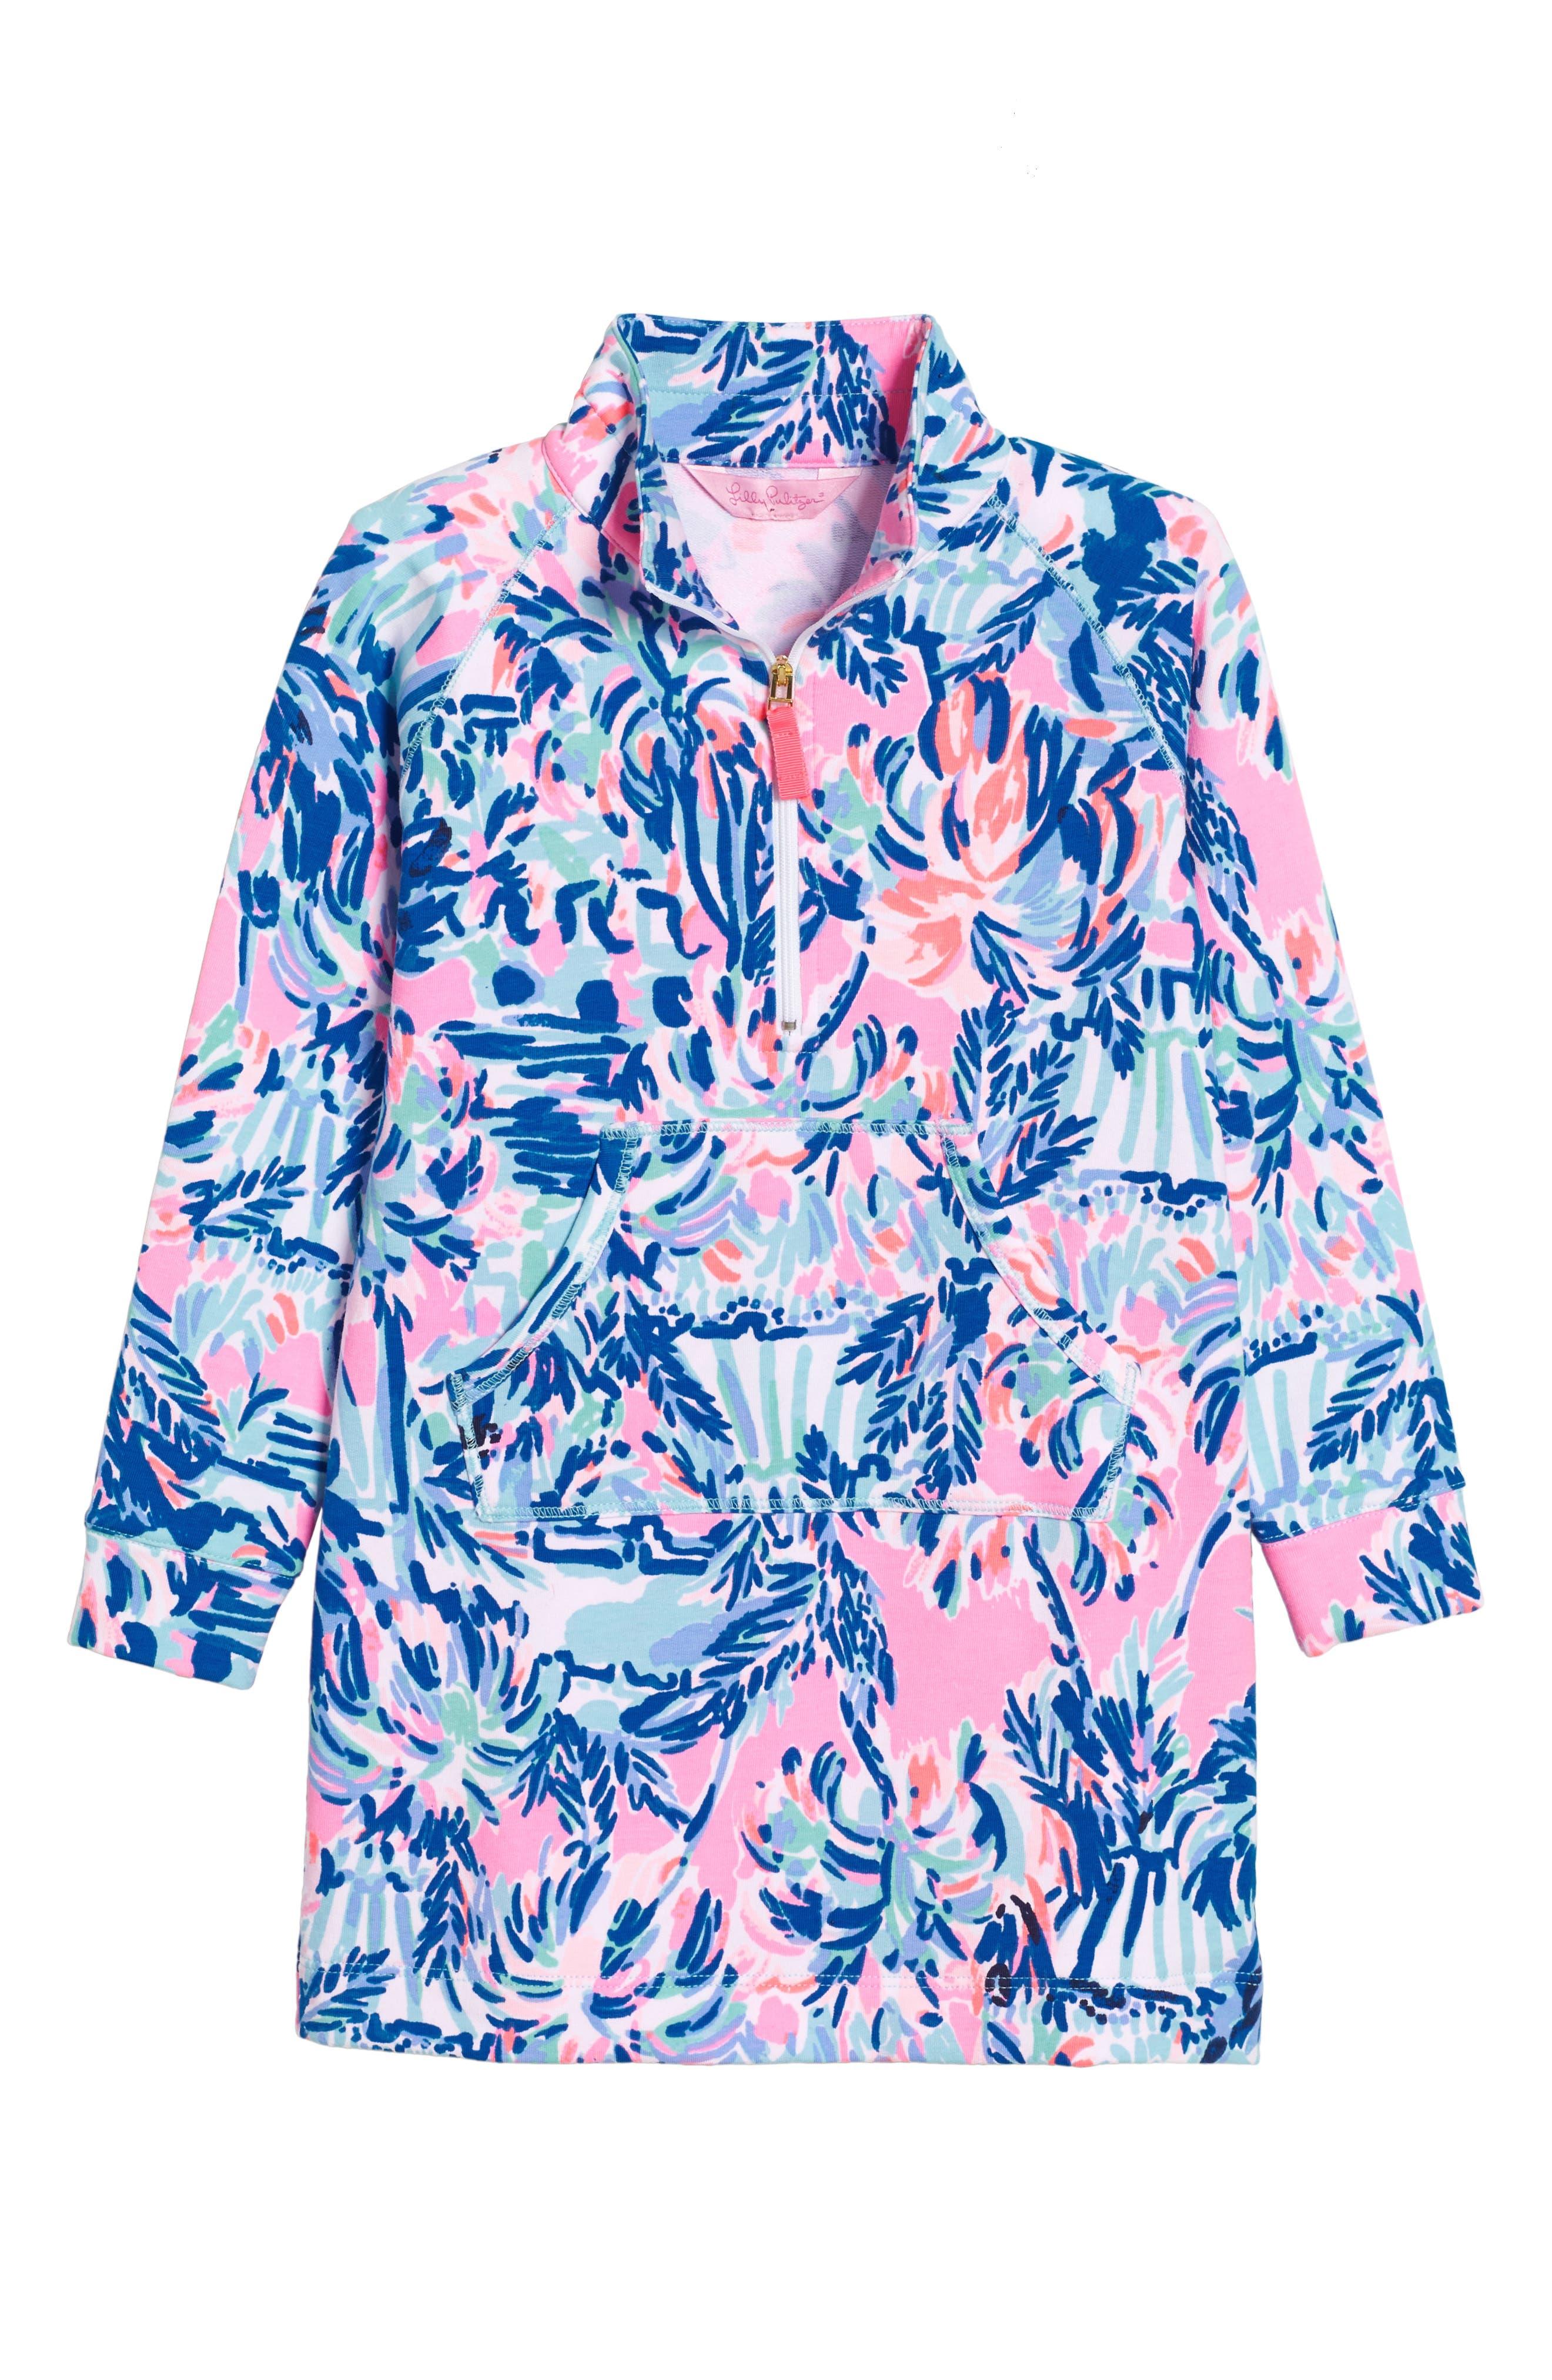 Alternate Image 1 Selected - Lilly Pulitzer® Mini Skipper Dress (Toddler Girls, Little Girls & Big Girls)